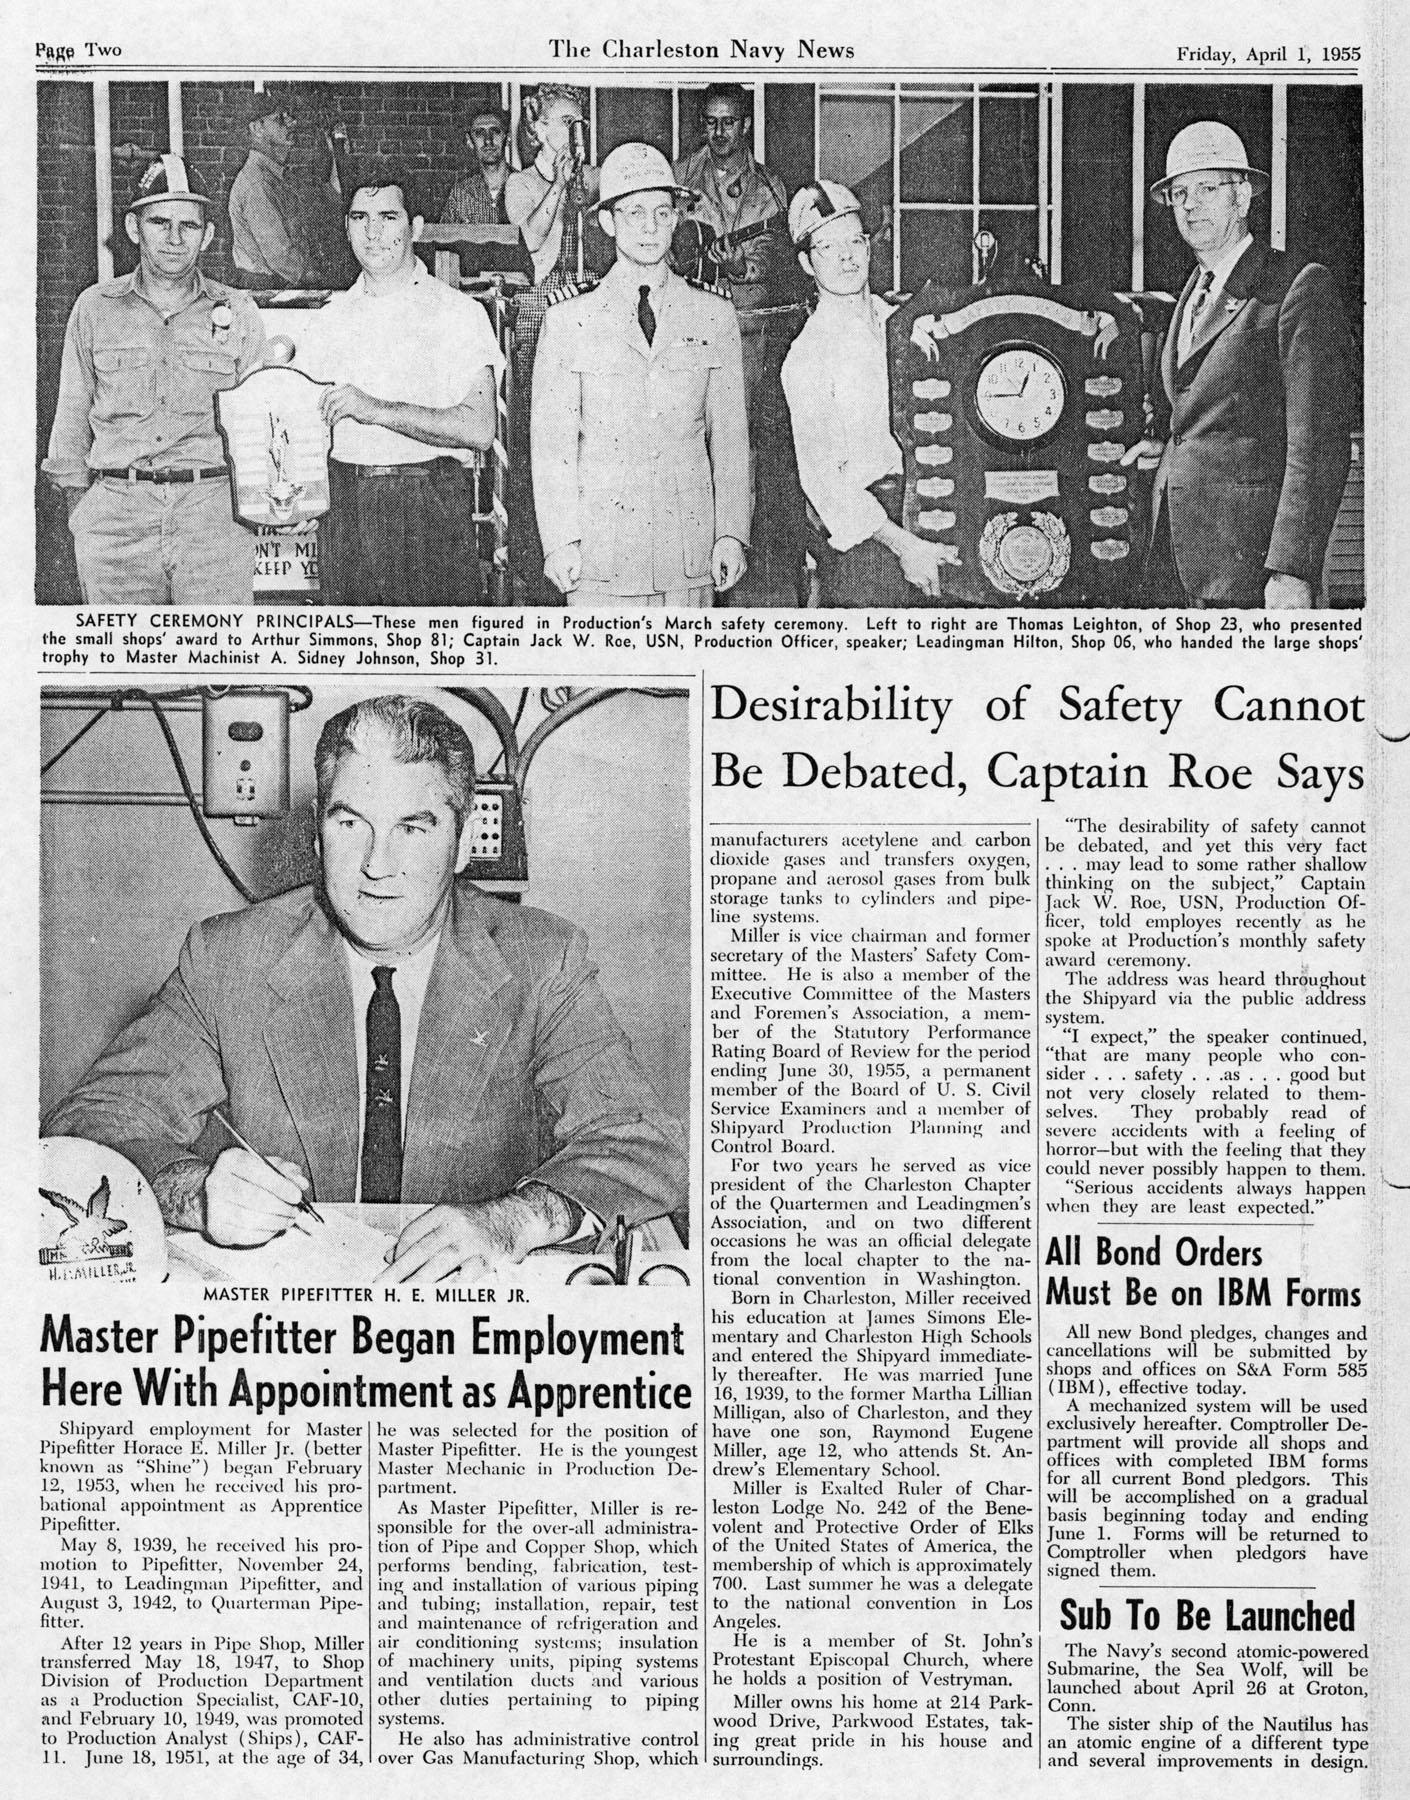 The Charleston Navy News, Volume 13, Edition 19, page ii